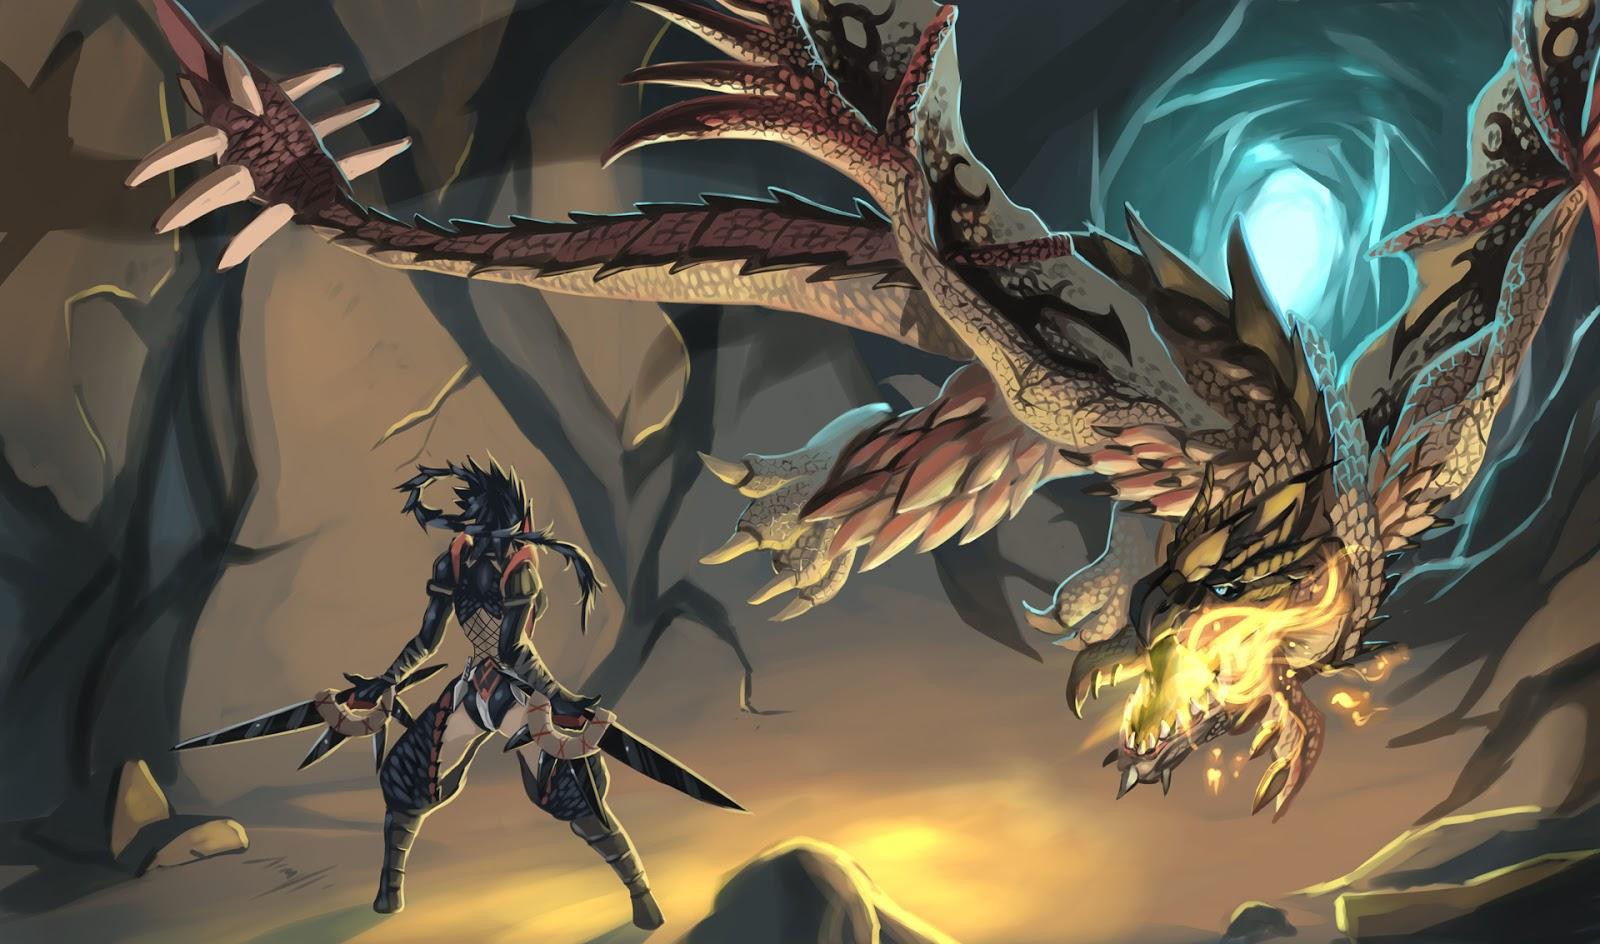 Anime Dragon Wallpaper - WallpaperSafari